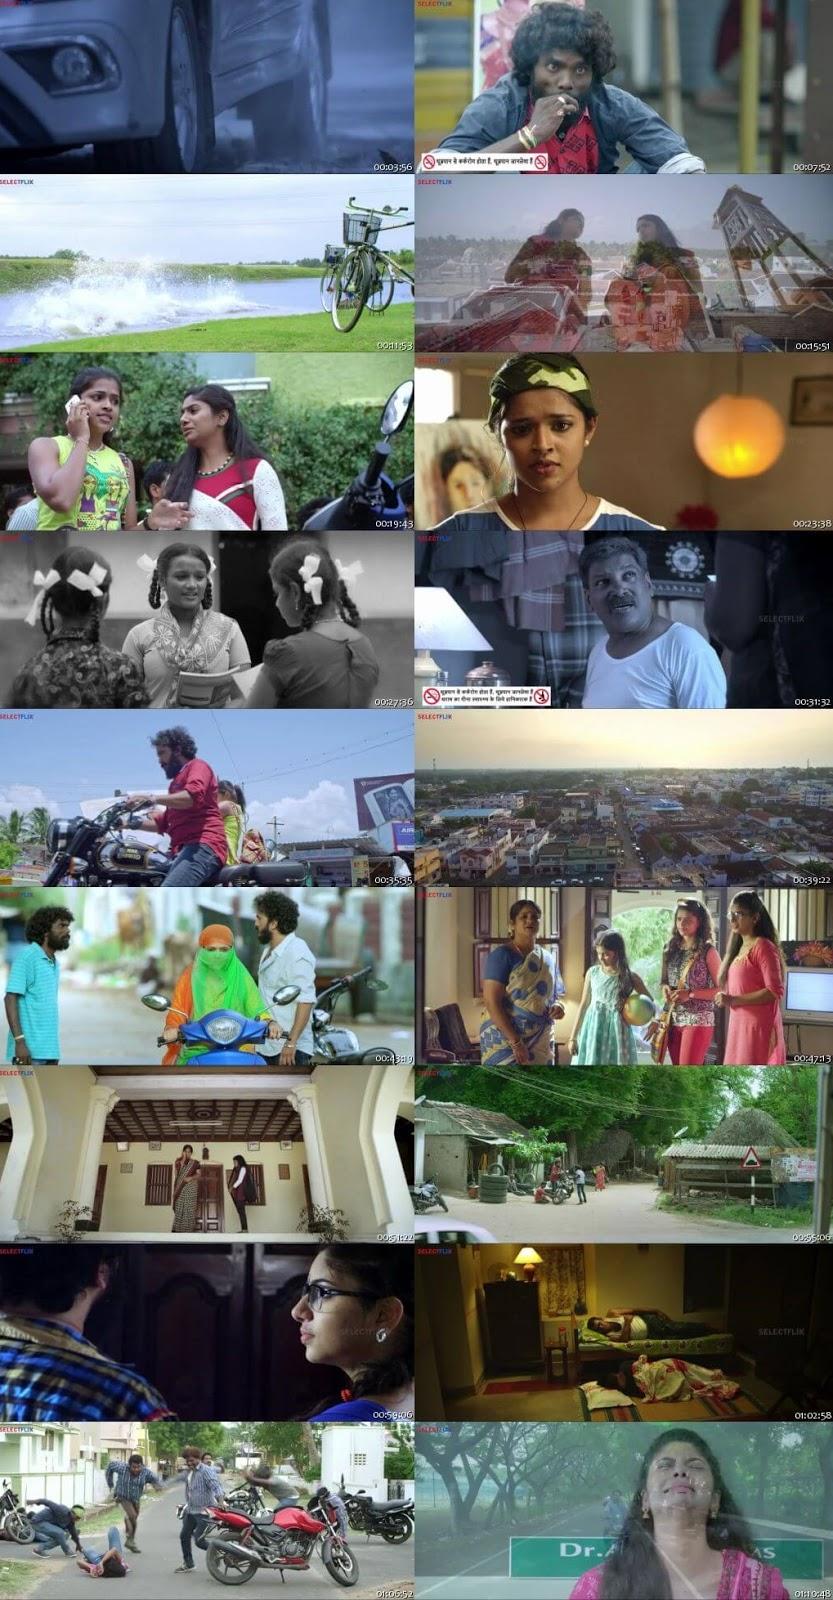 Imai 2017 Full Movie Download Hindi Dubbed 480p HDRip